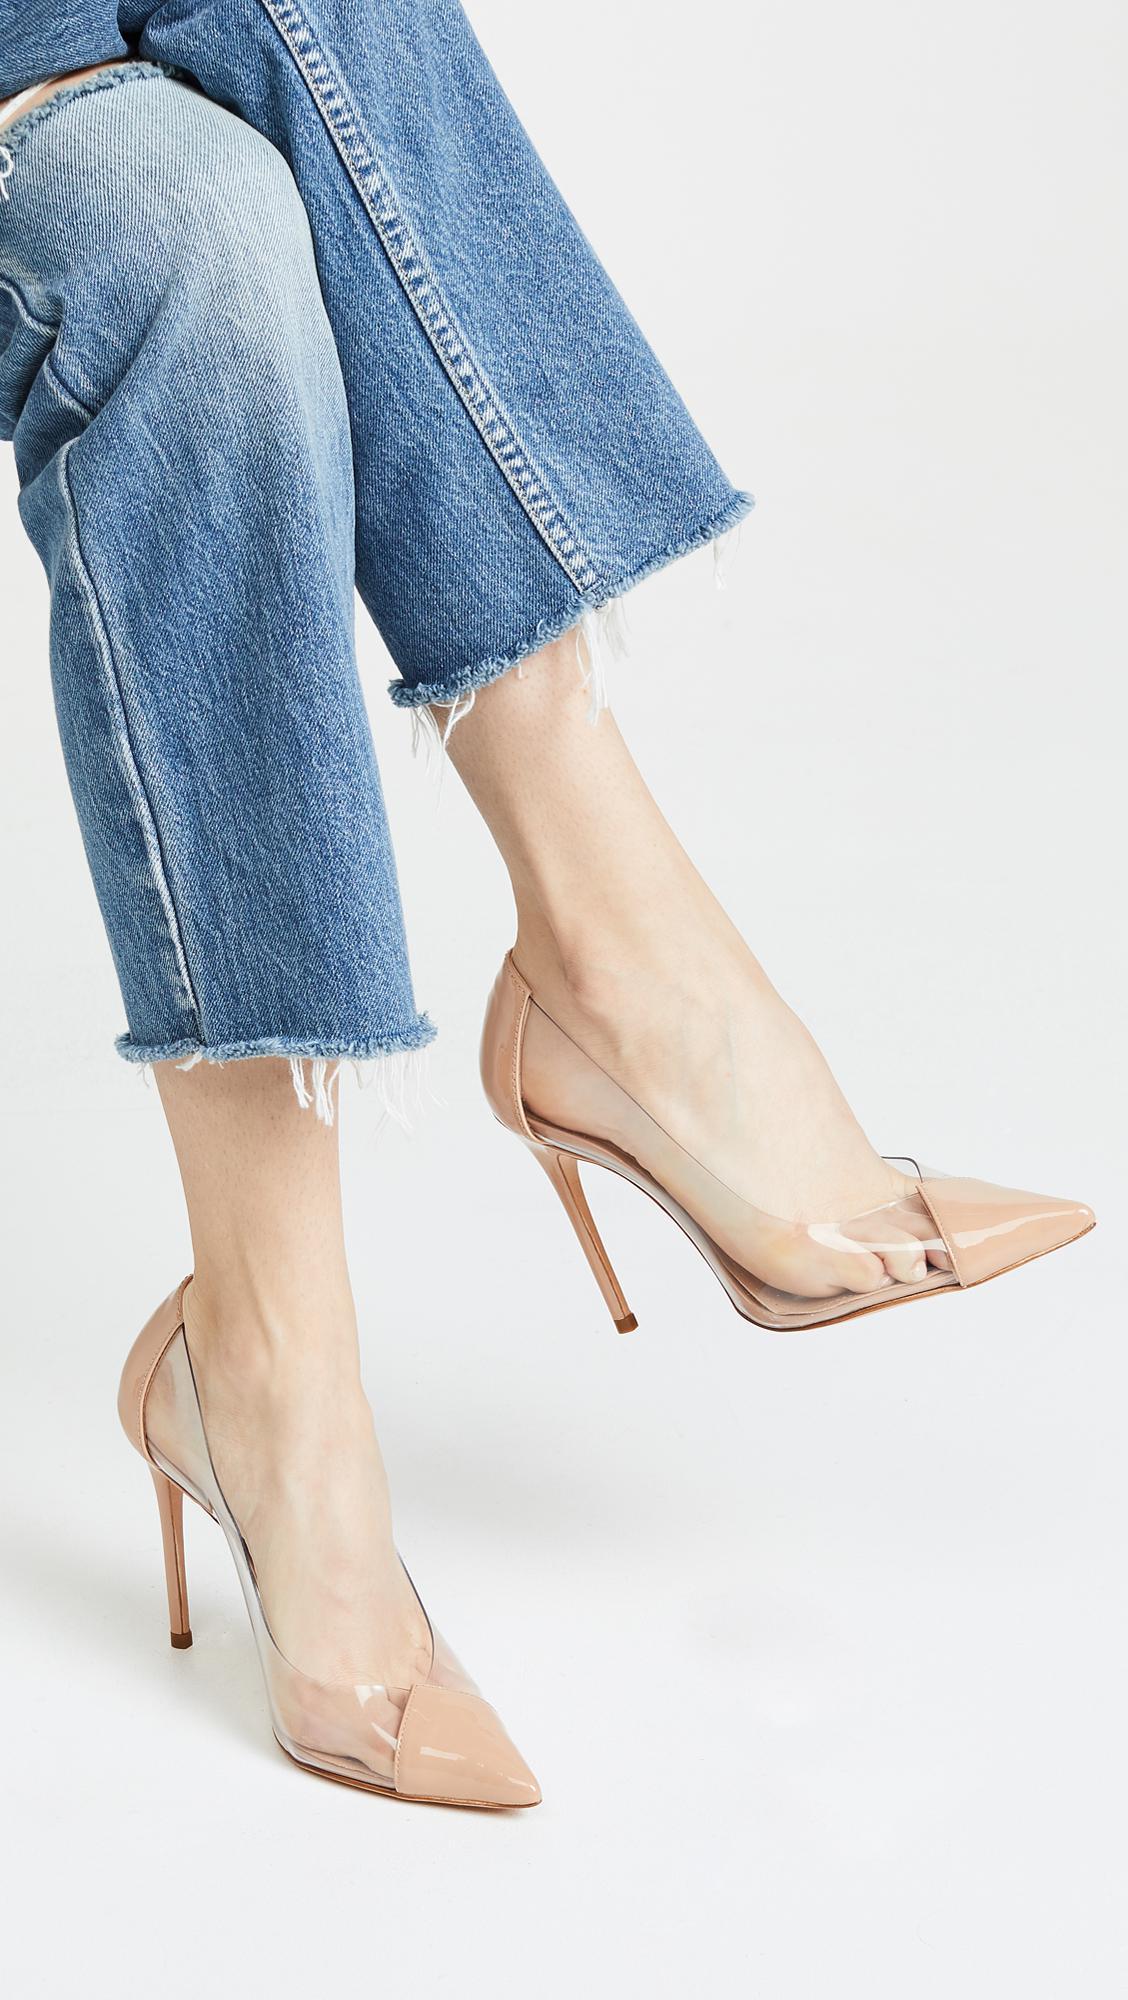 5bc333691796f Schutz - Natural Women s Cendi Patent Leather High-heel Pumps - Lyst. View  fullscreen